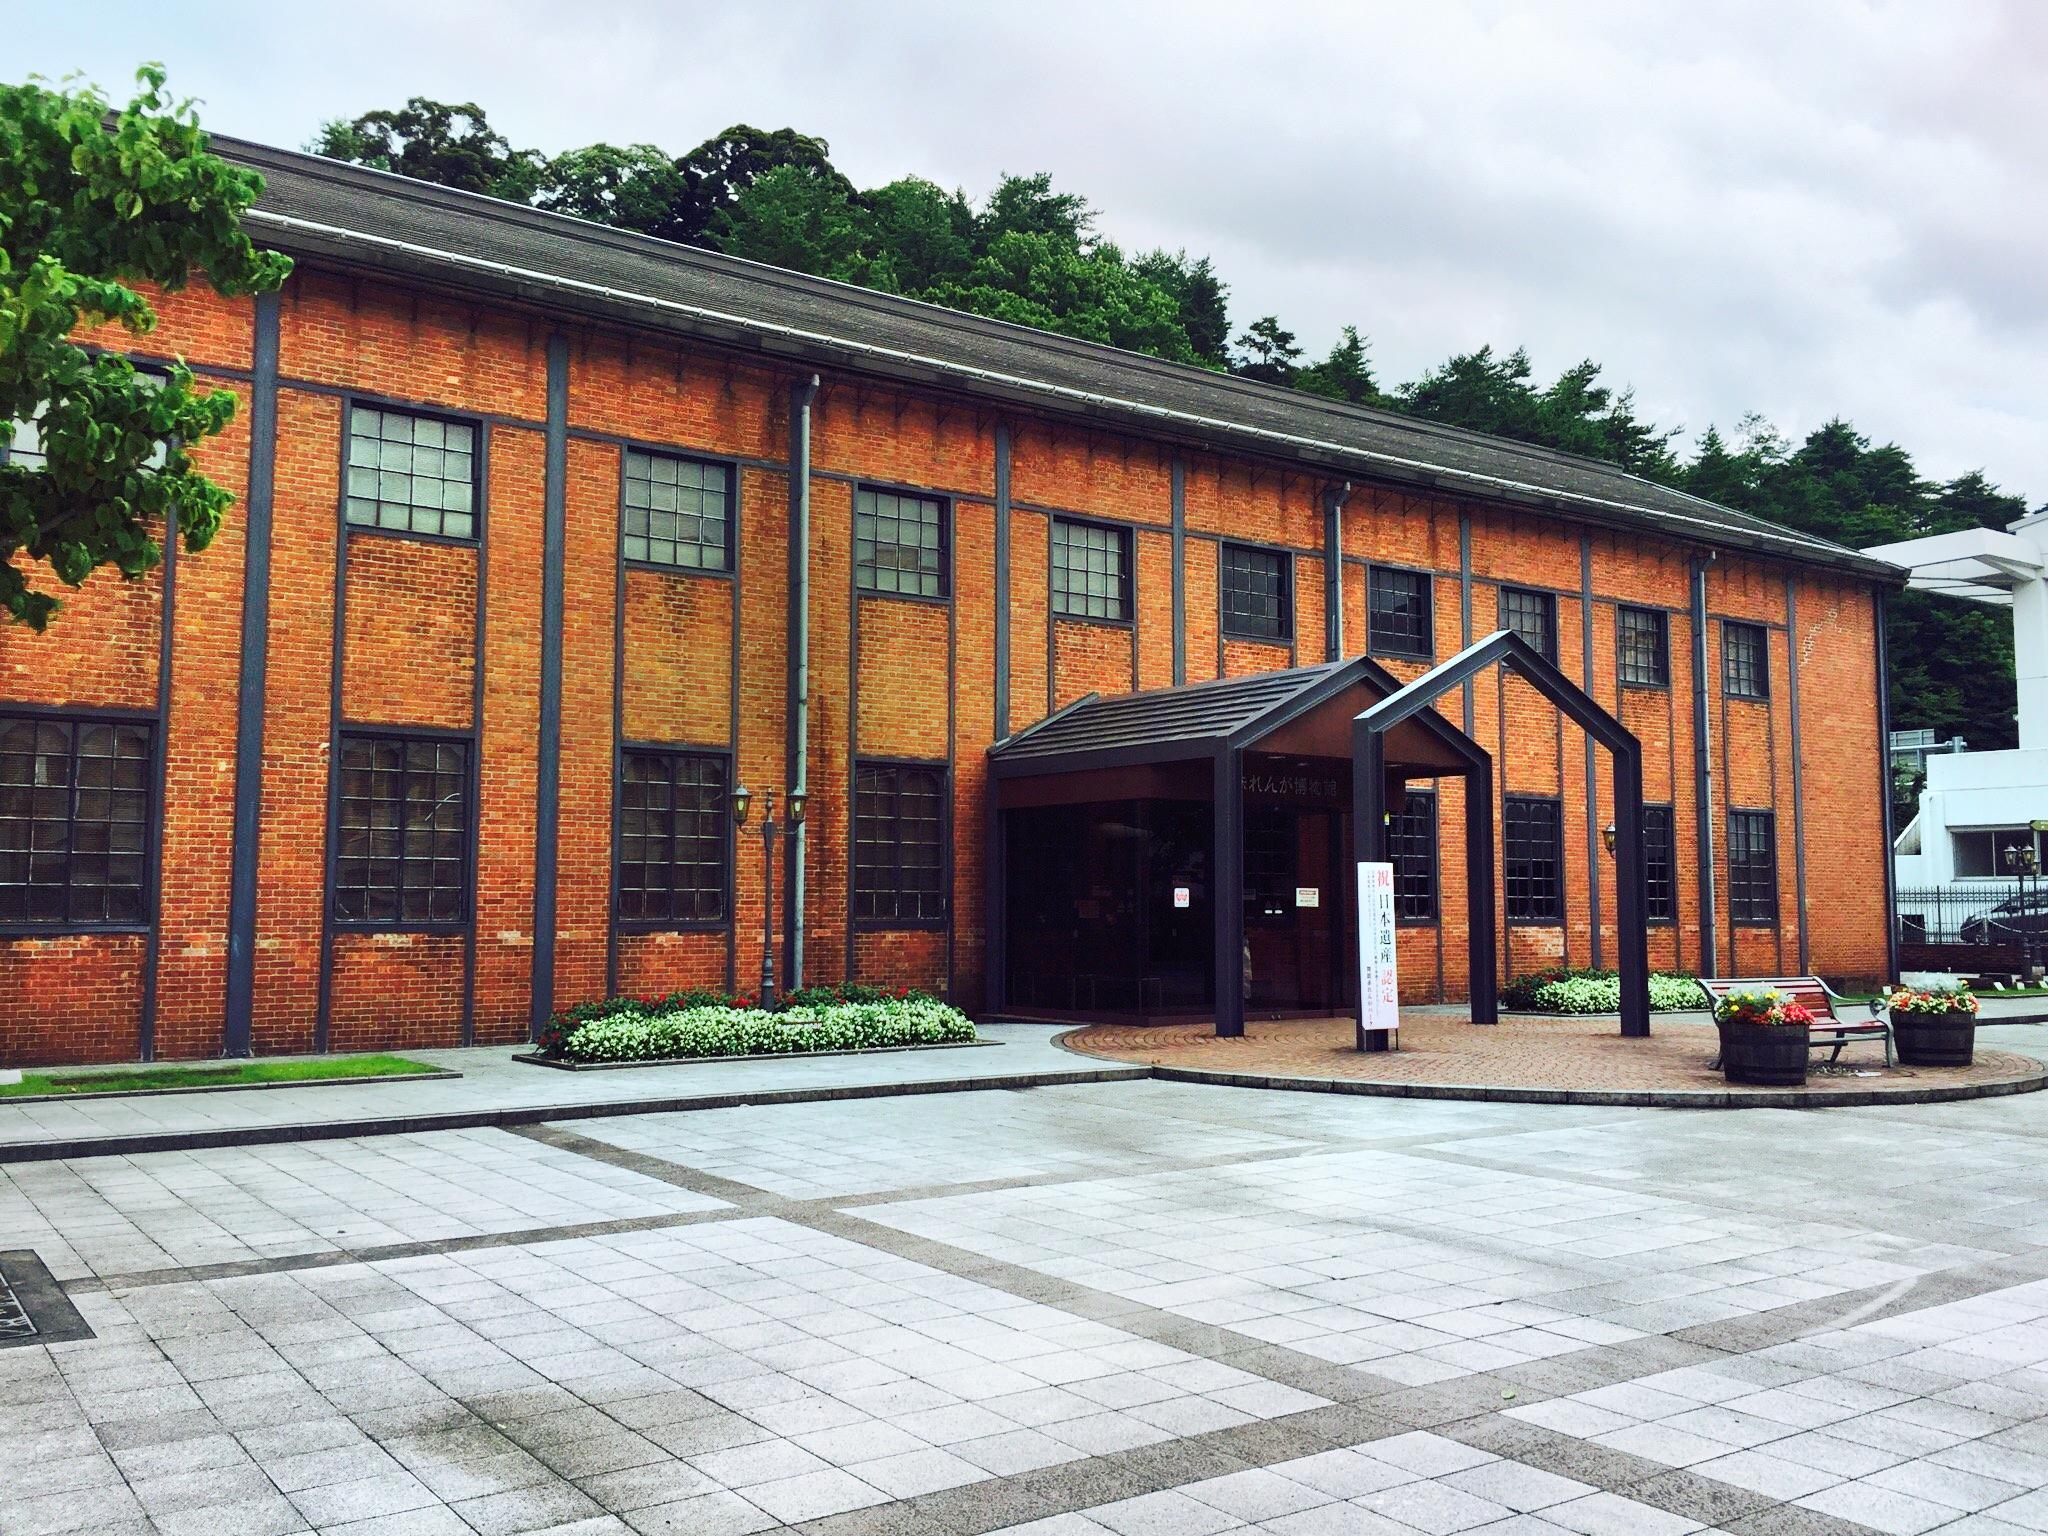 Museum of Redbrick